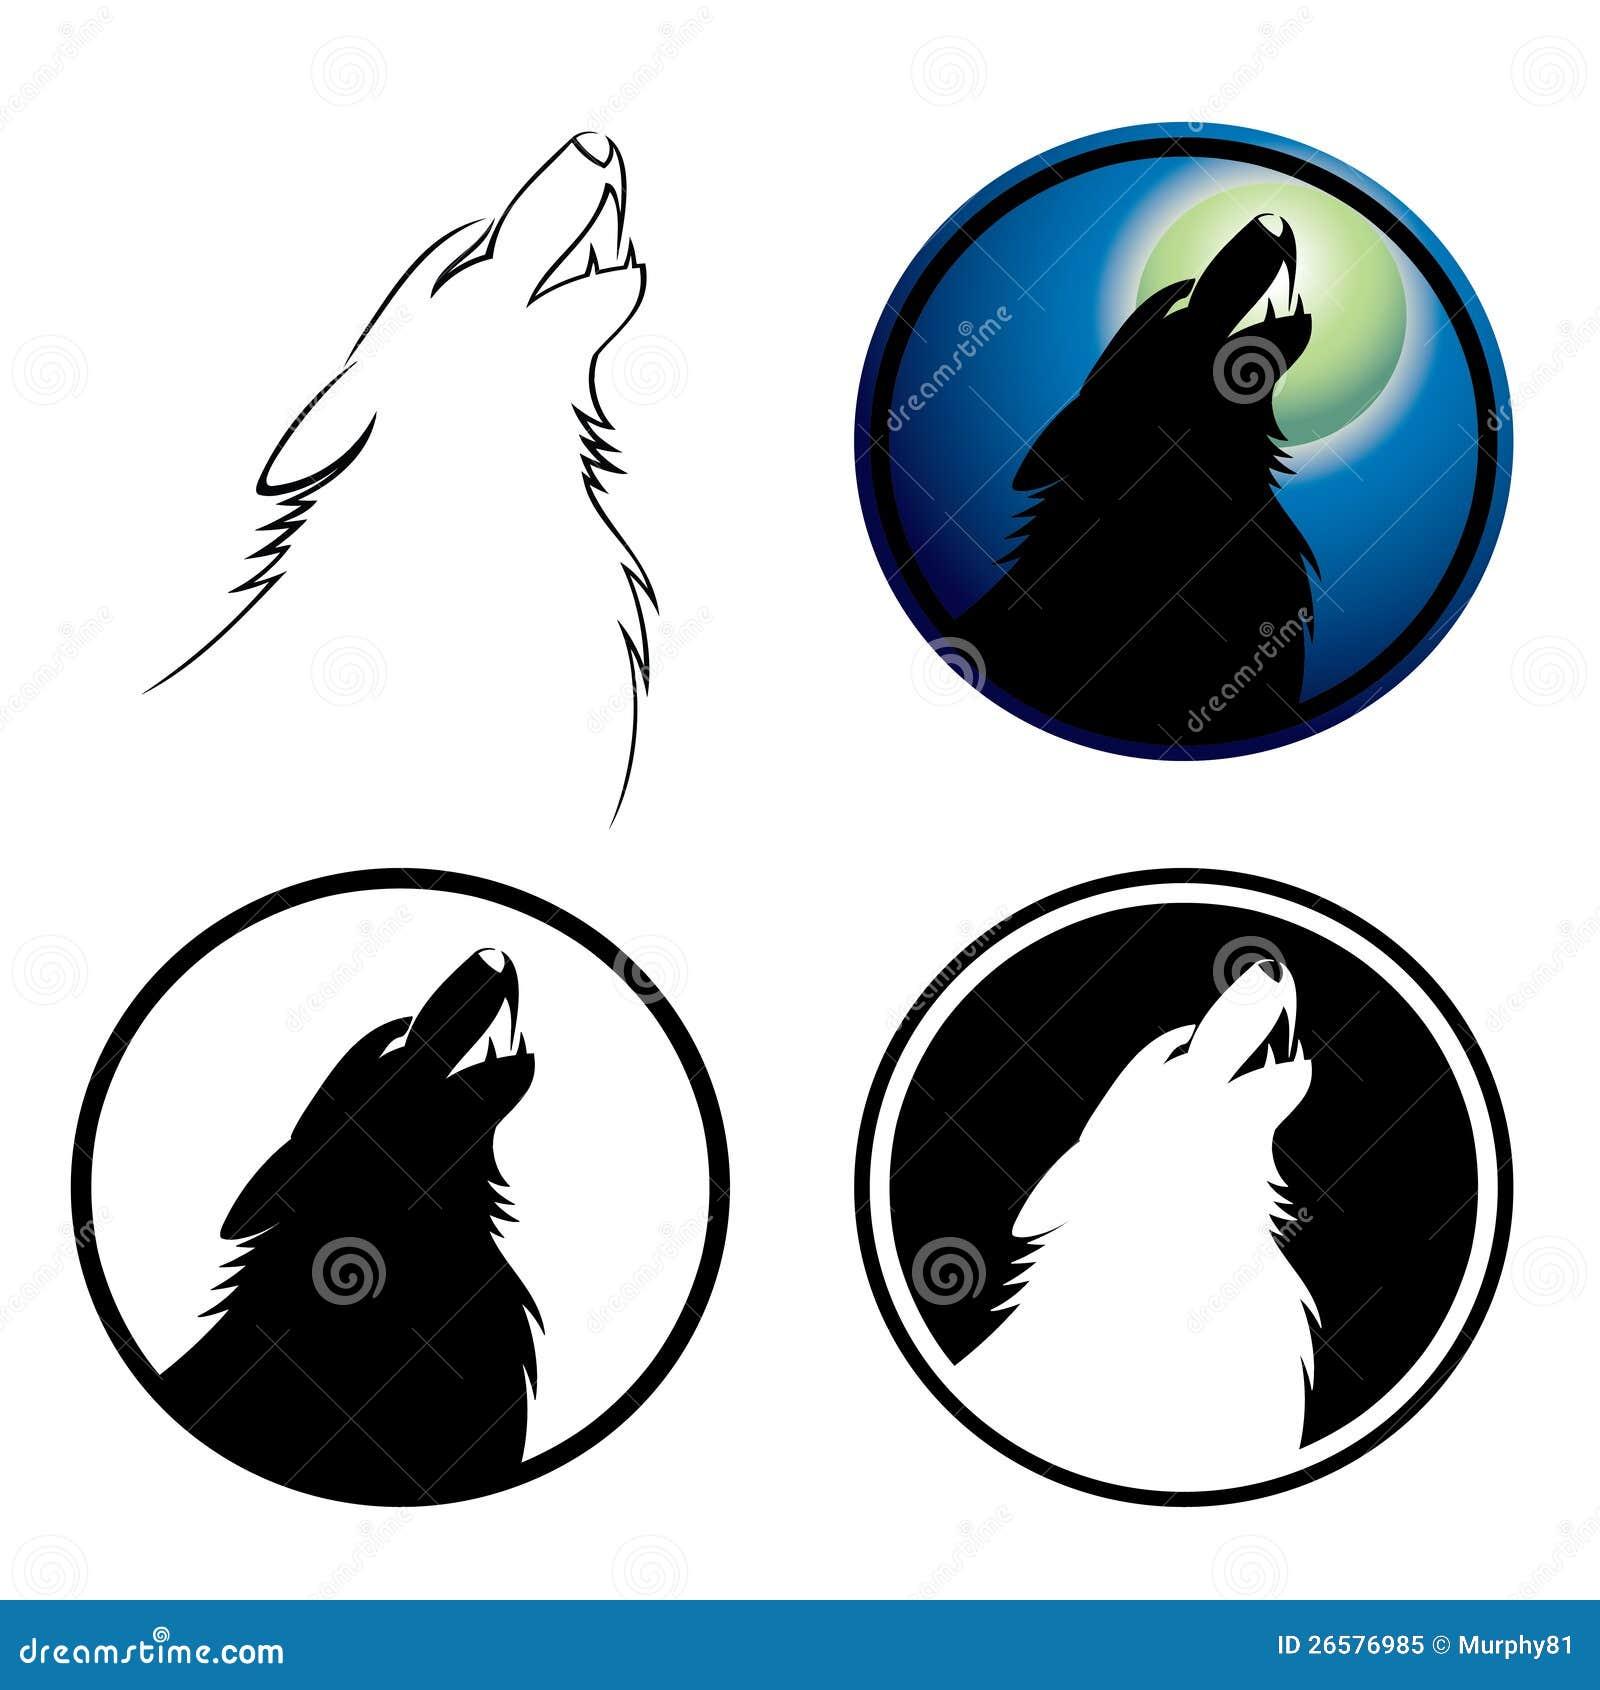 Howling Wolf Symbol Royalty Free Stock Photo - Image: 26576985